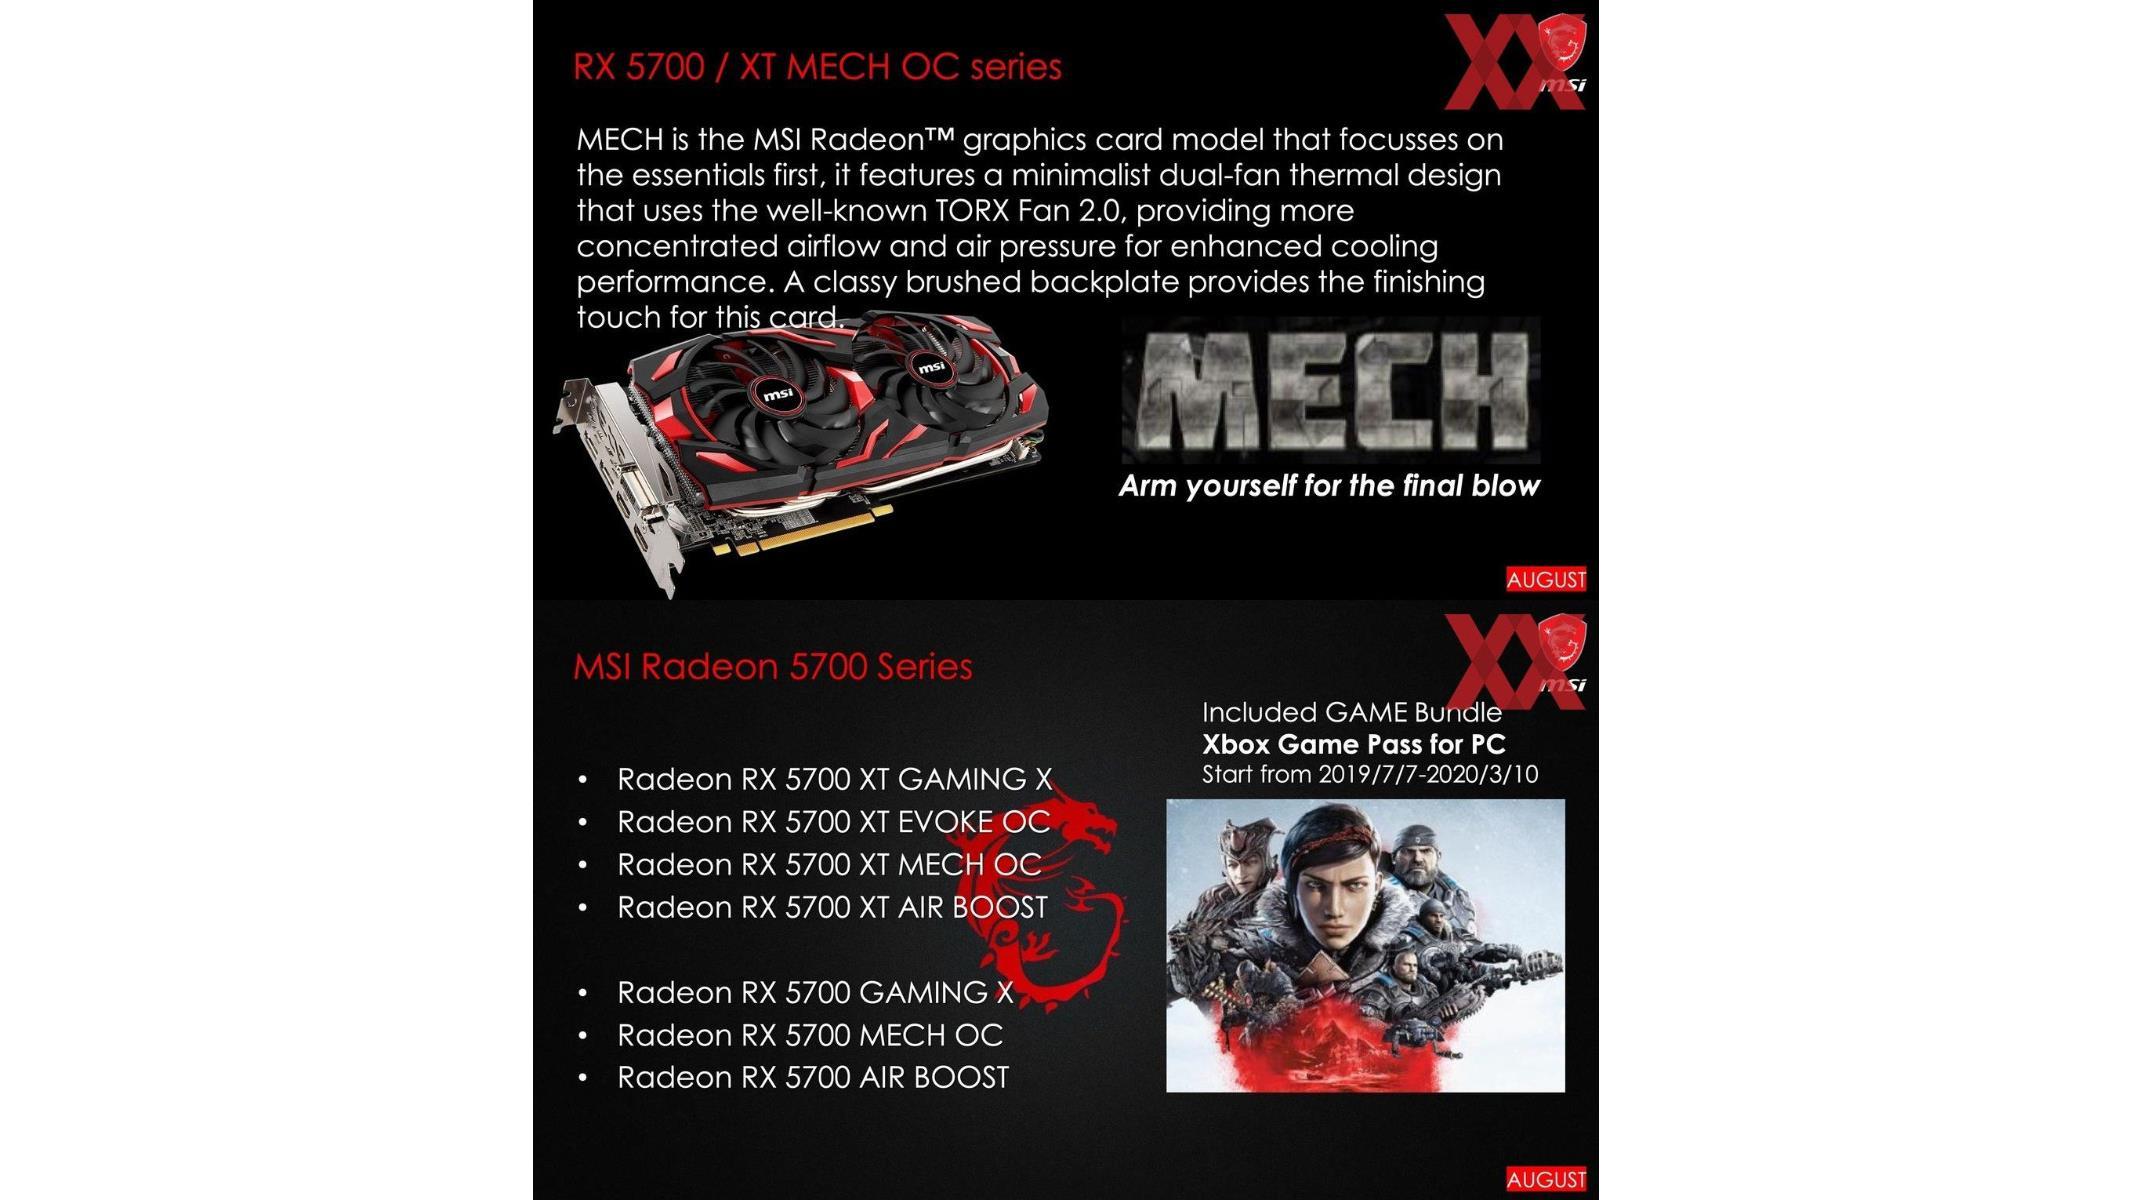 MSI Preps AMD Radeon RX 5700 Navi Graphics Card Arsenal With